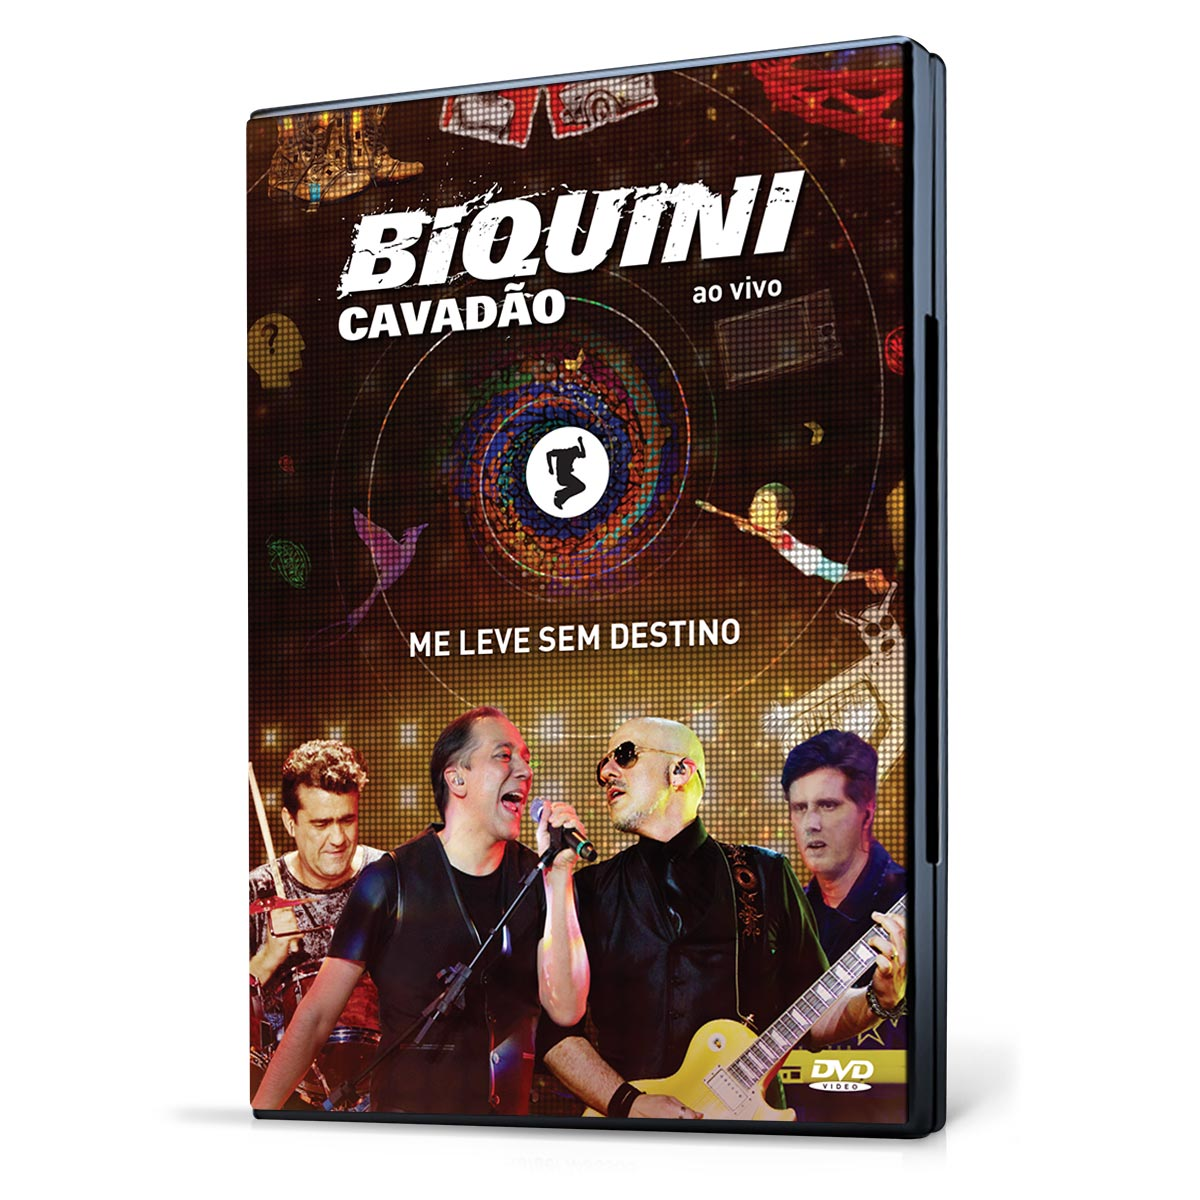 DVD Biquini Cavad�o Me Leve Sem Destino